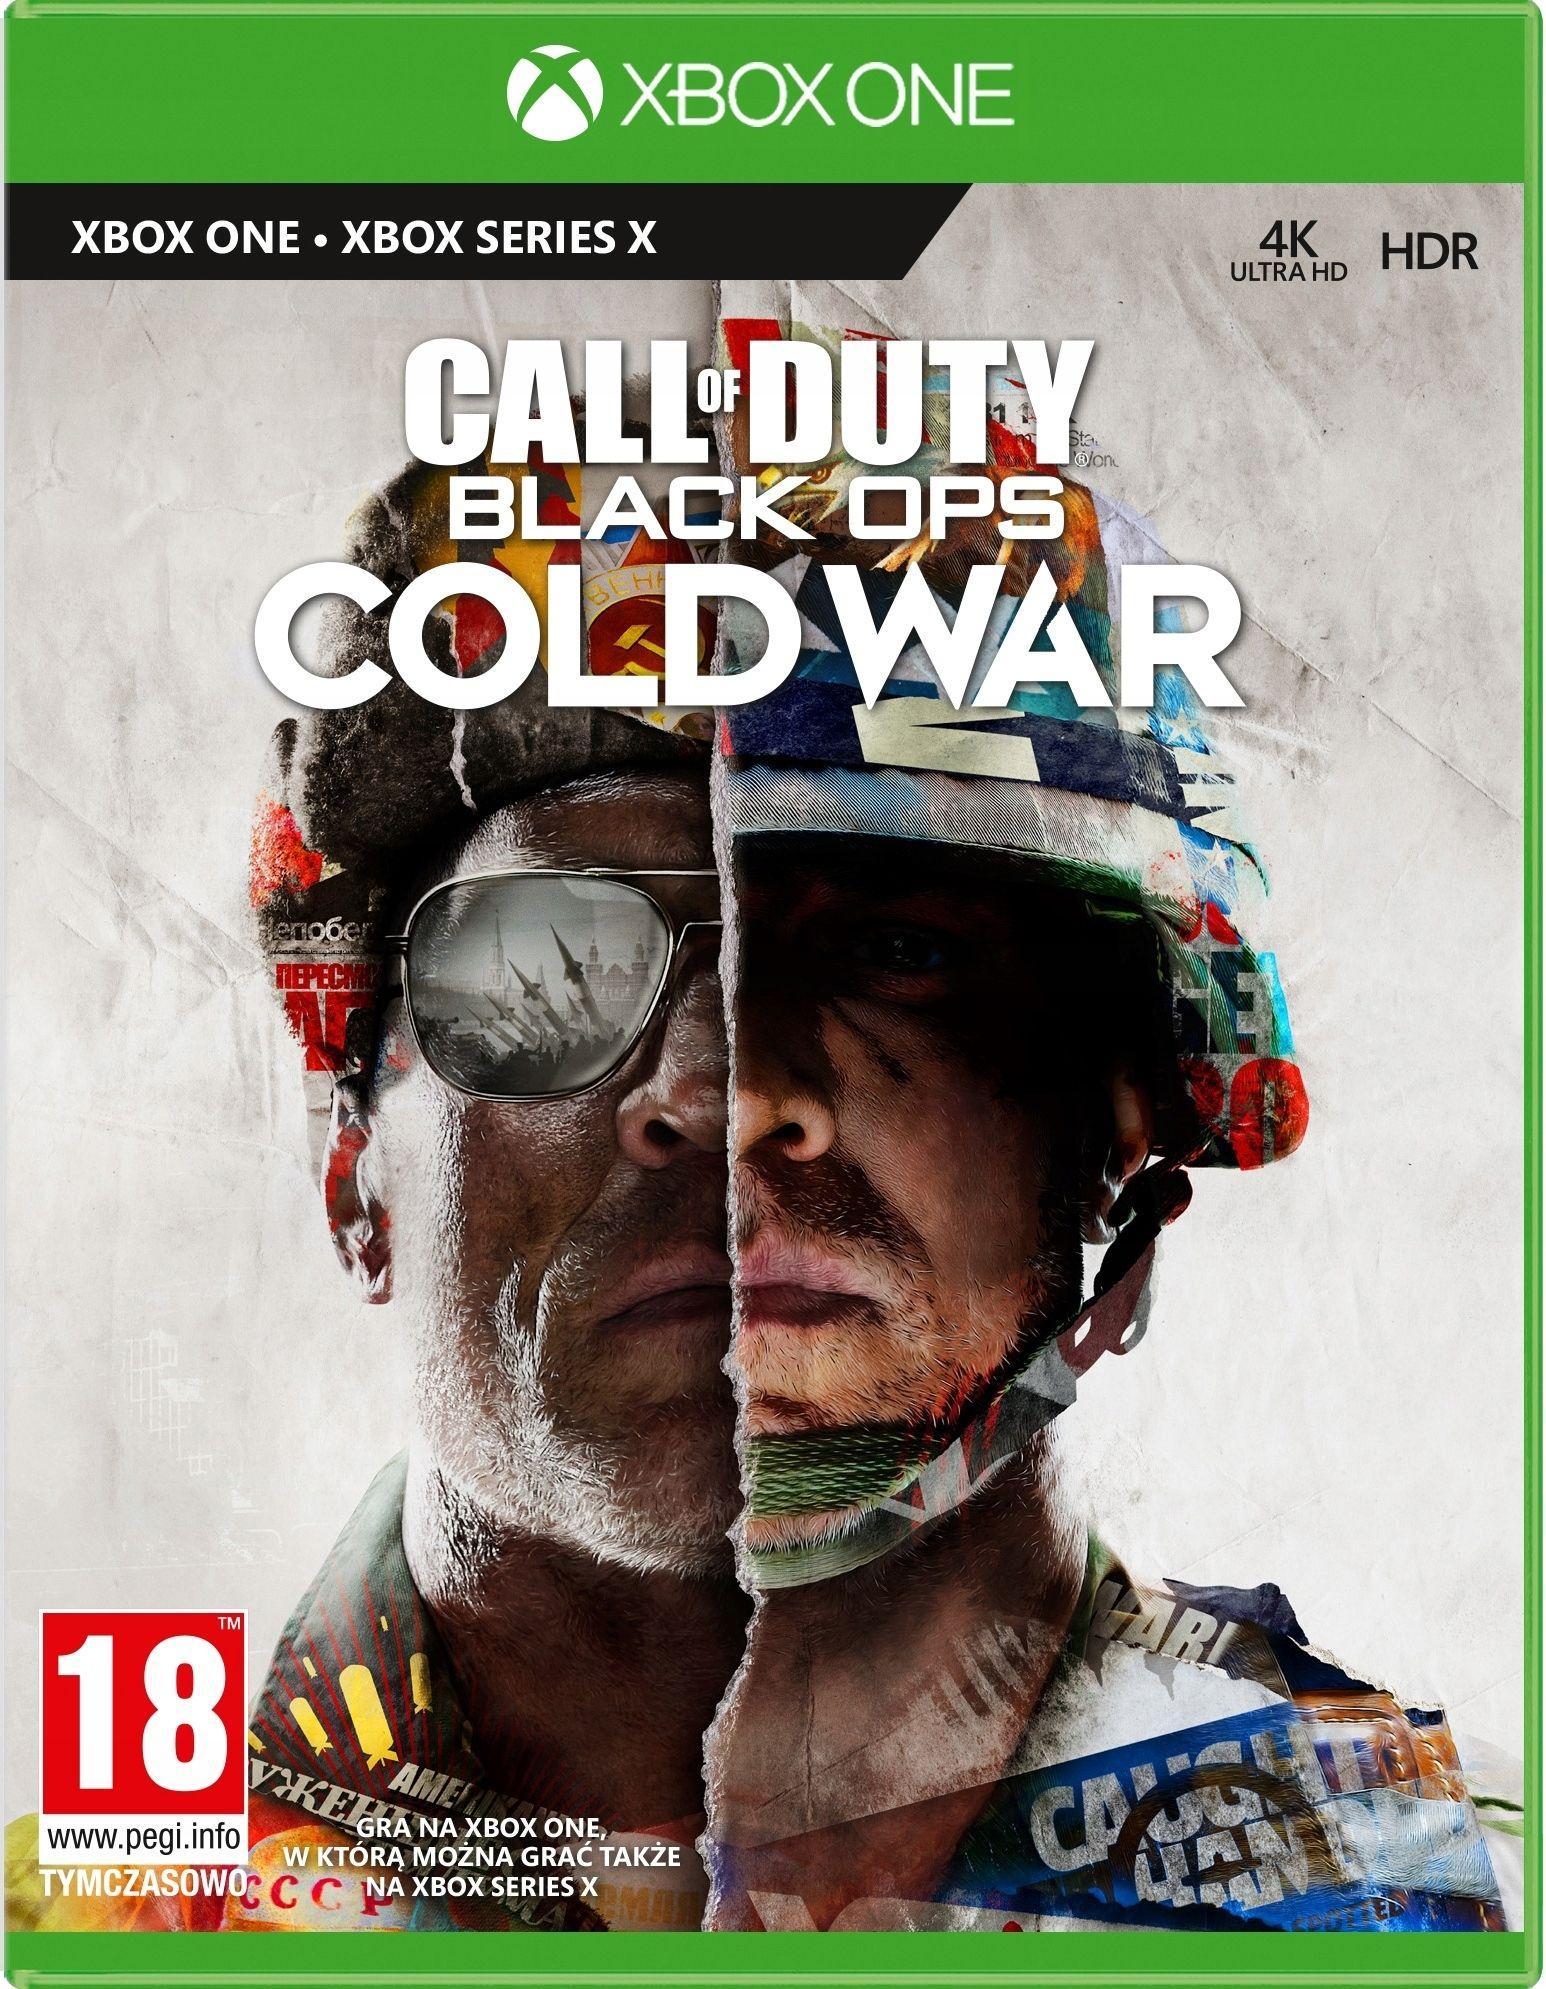 Kopie Call of Duty: Black Ops Cold War za 70 GBP (23,33 GBP za sztukę) w Microsoft Store